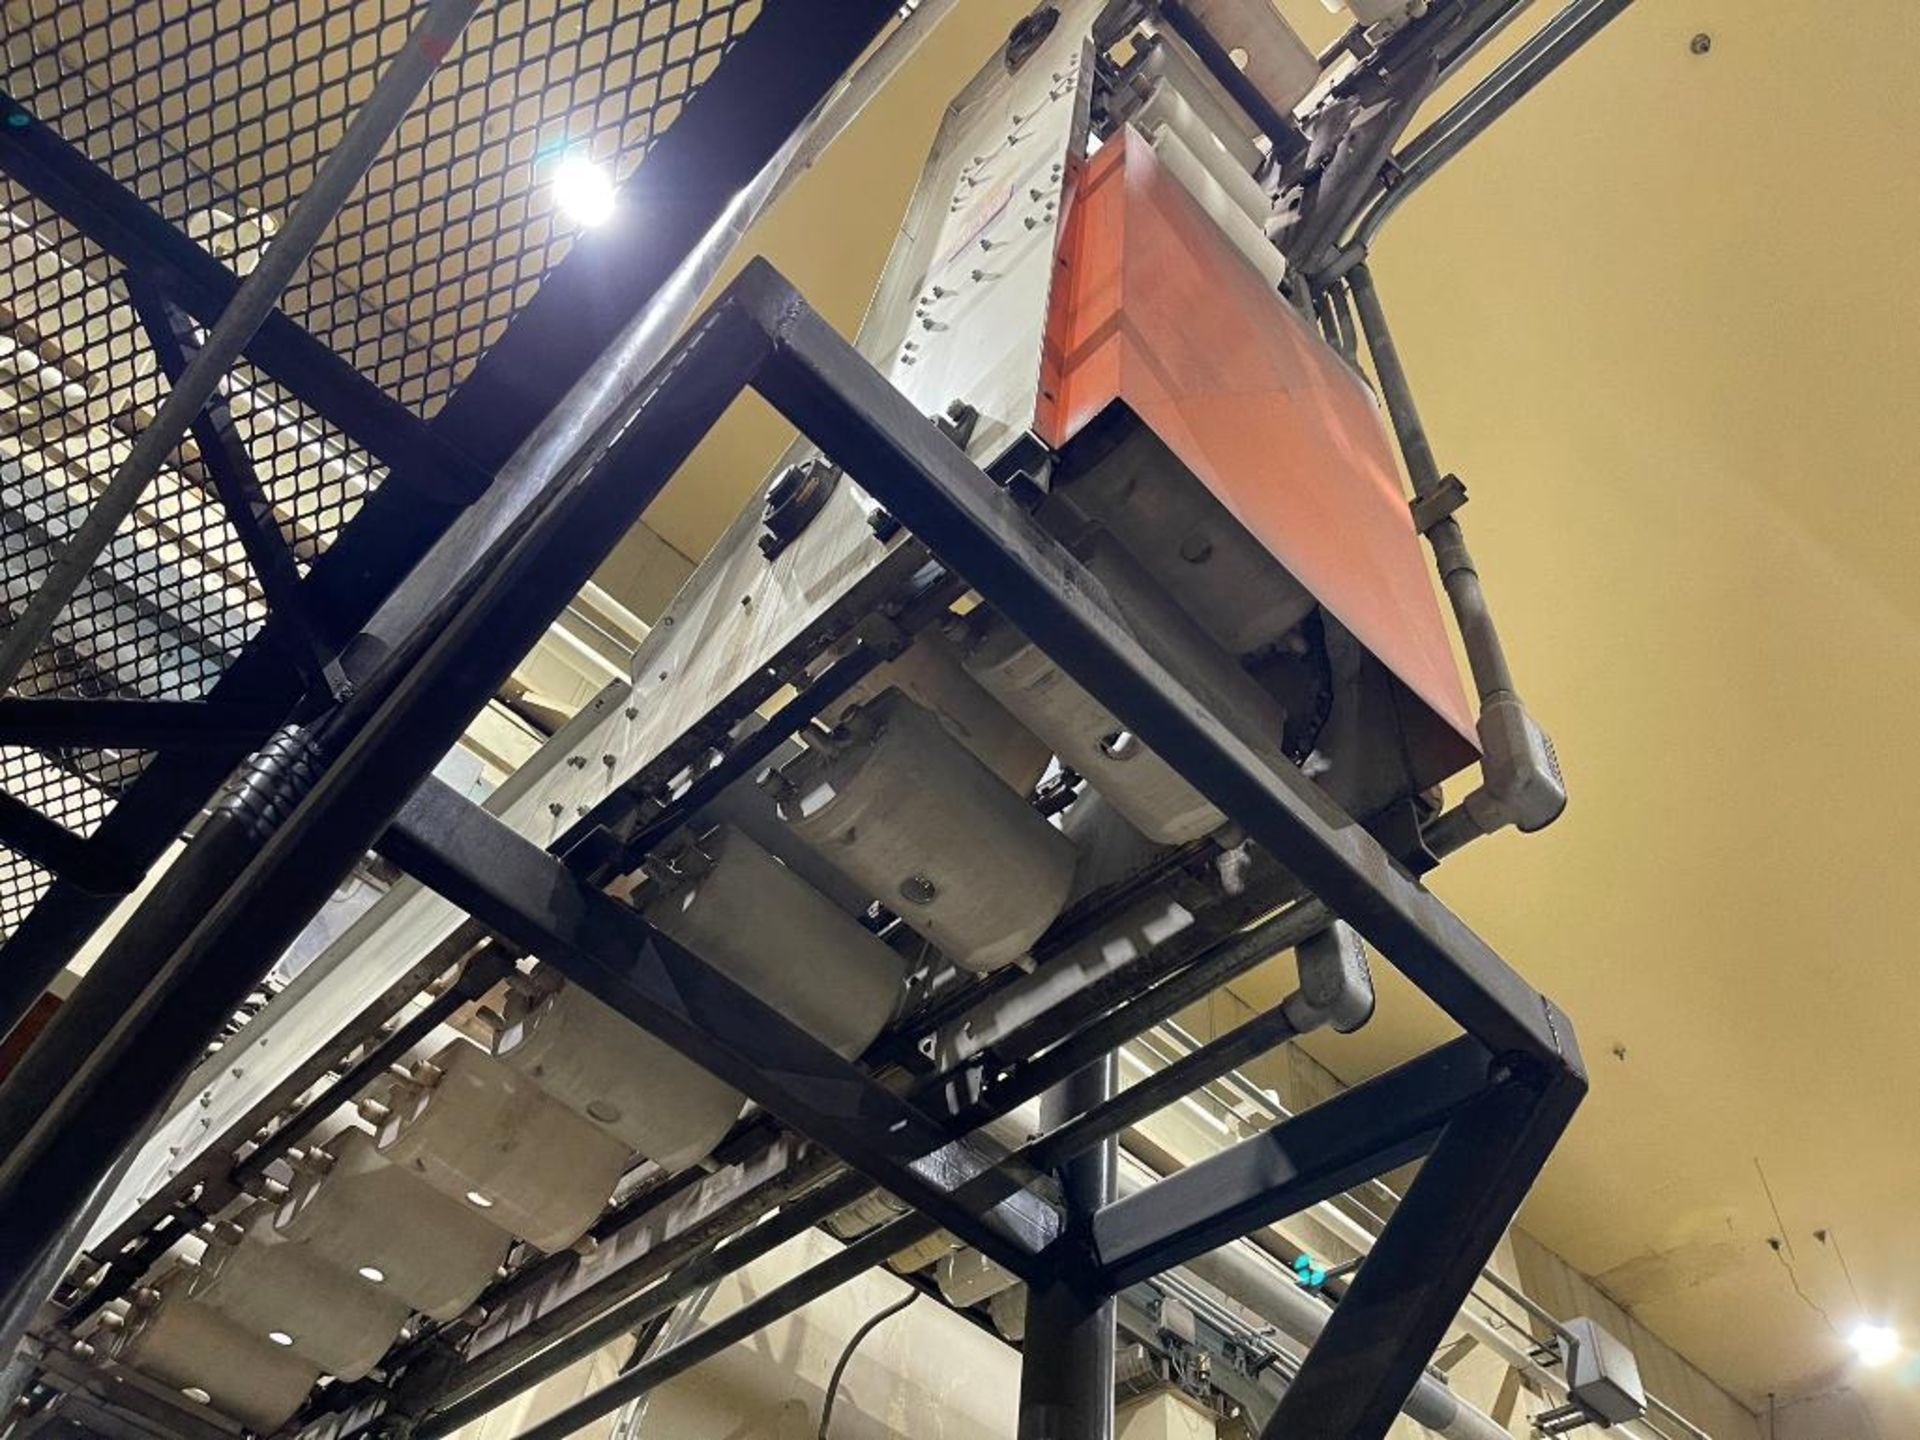 Meyer horizontal bucket elevator, model PC-072-12-BCC - Image 14 of 18